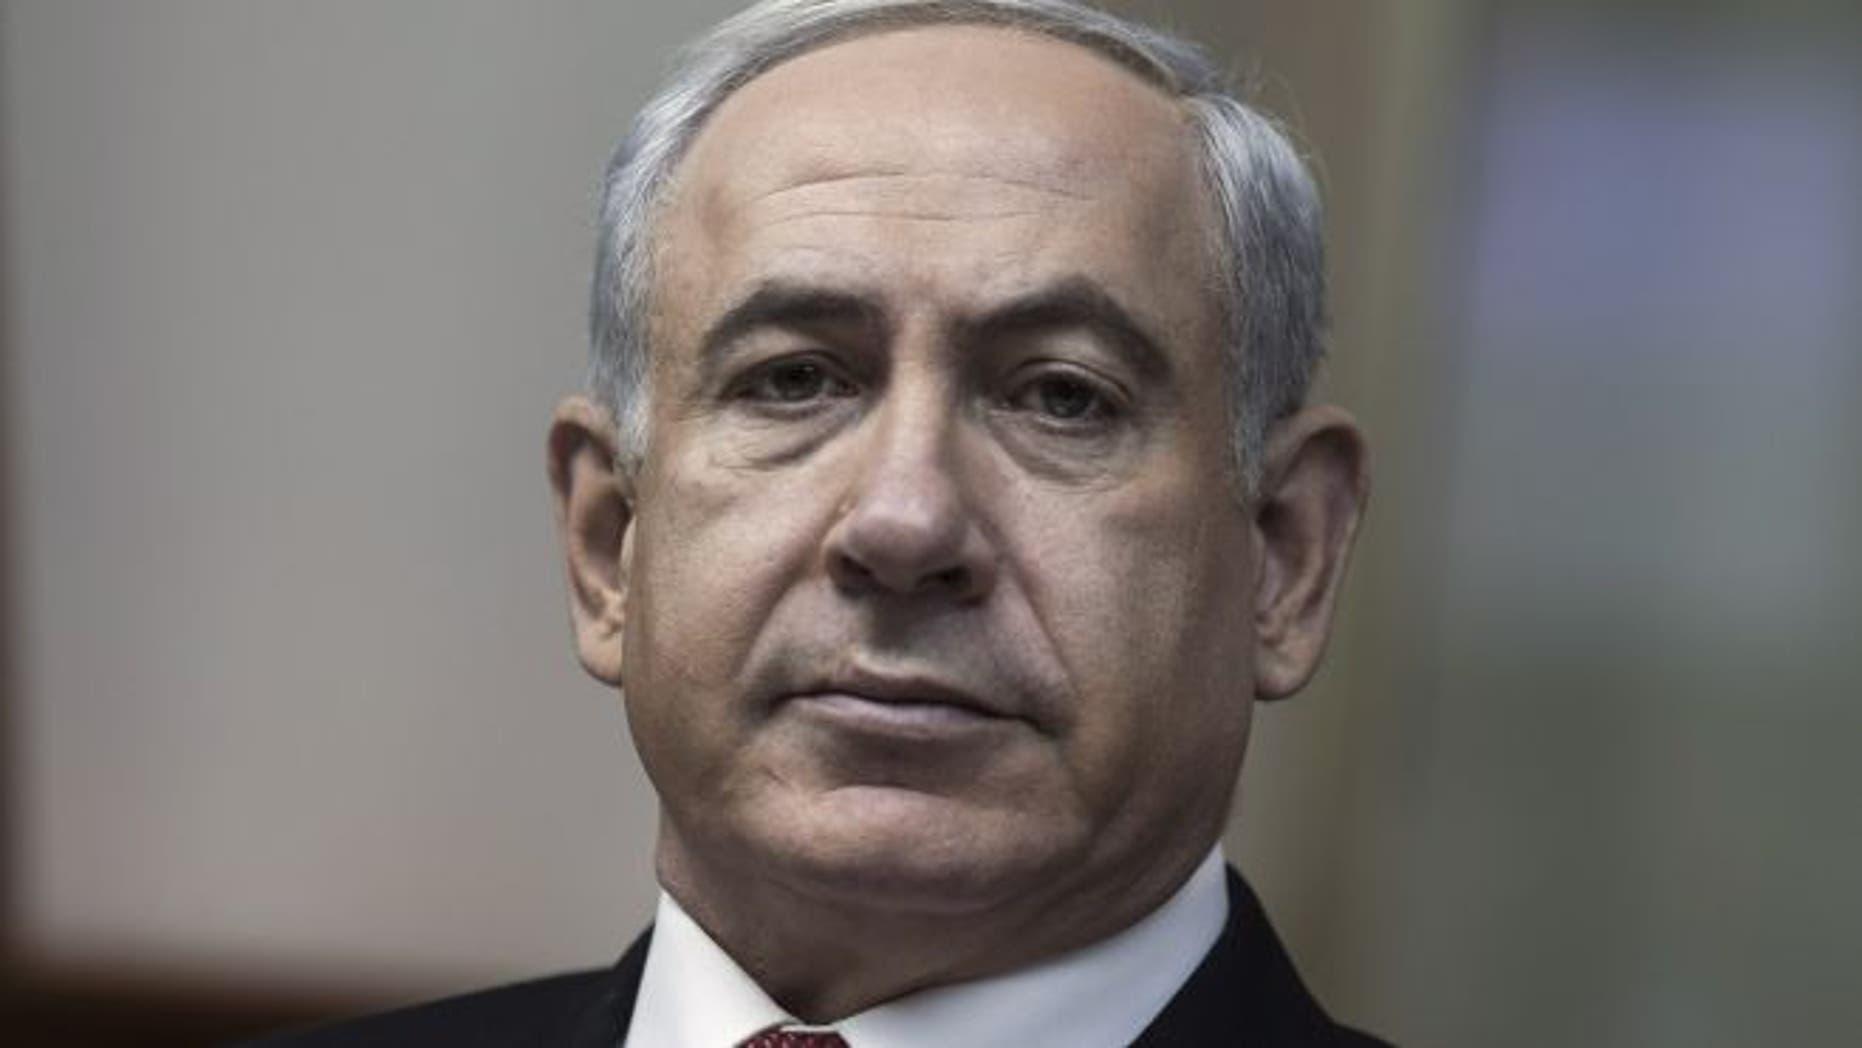 Feb. 3, 2013: Israeli Prime Minister Benjamin Netanyahu attends his weekly cabinet meeting in his Jerusalem offices.